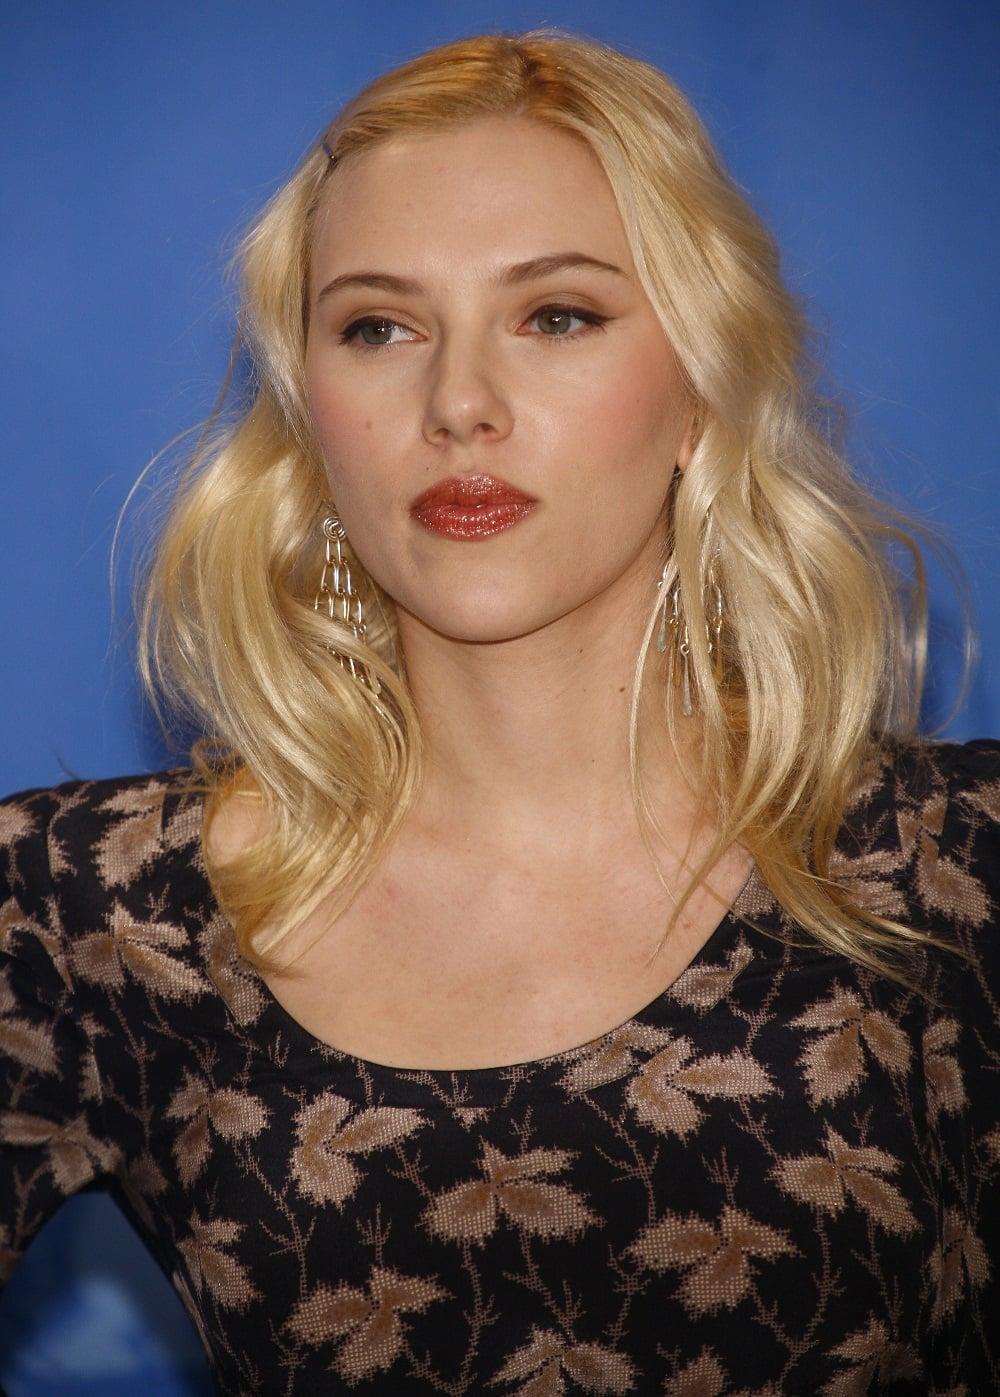 Scarlett Johansson Platinum Blonde The Hollywood Gossip